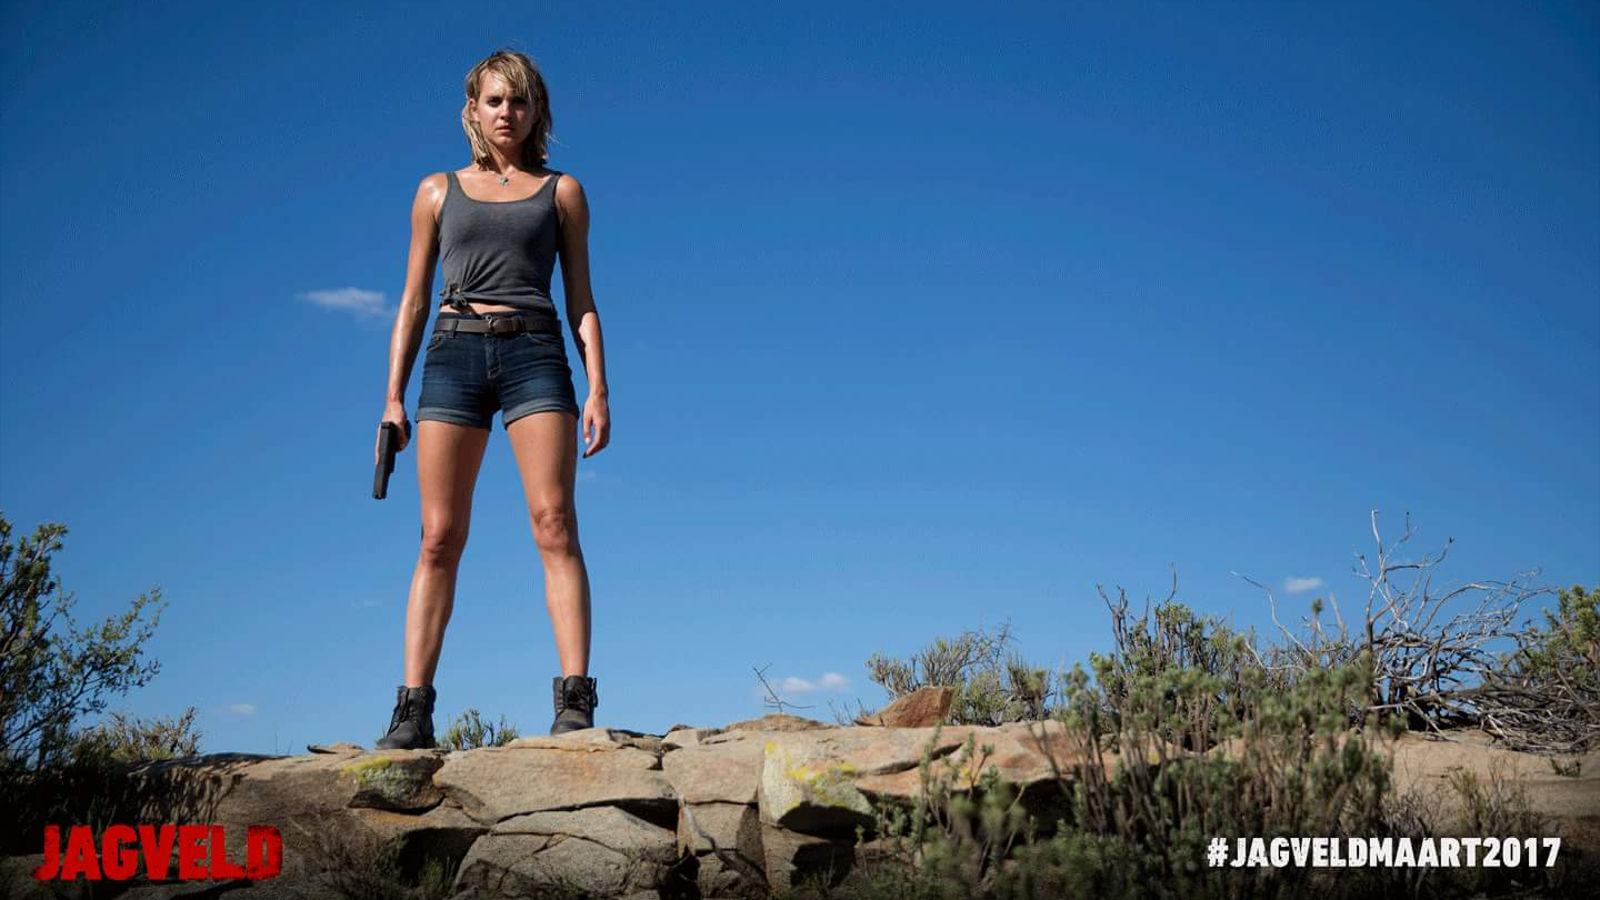 Vamers - FYI - TV & Movies - Jagveld goes on tour - 01